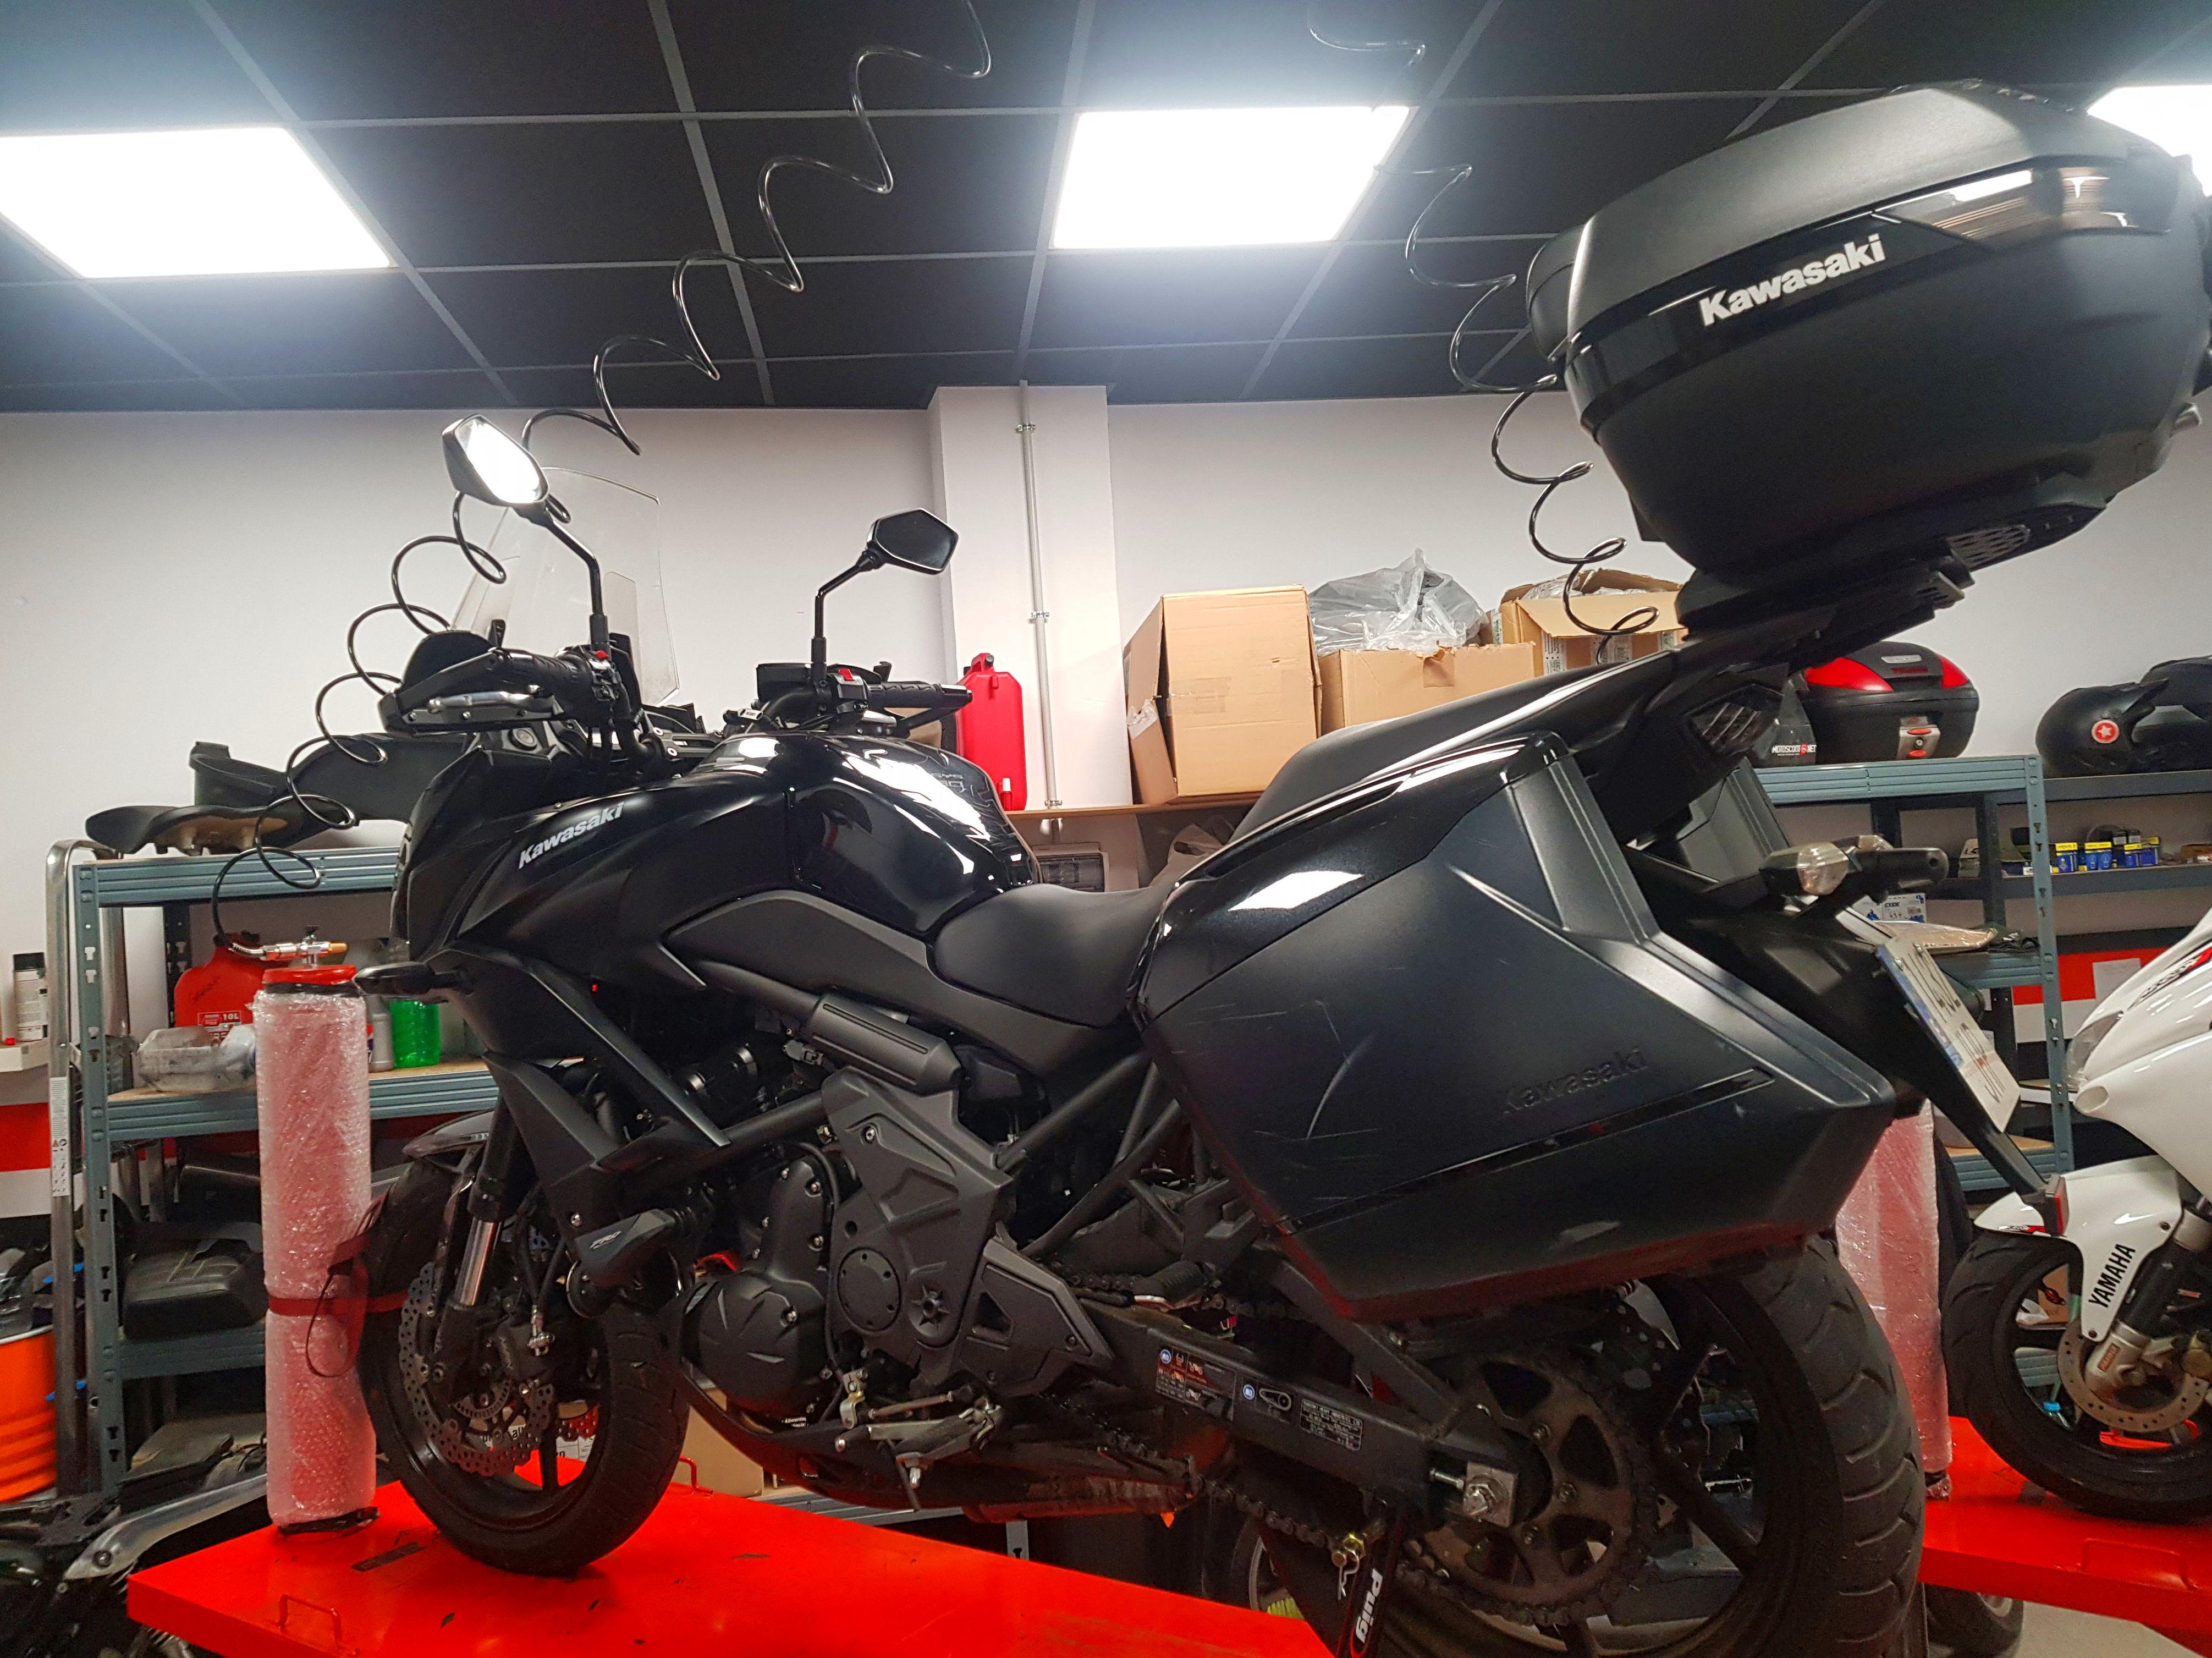 Foto 11 de Taller de motos multimarca en Mataró | Motos Iluro